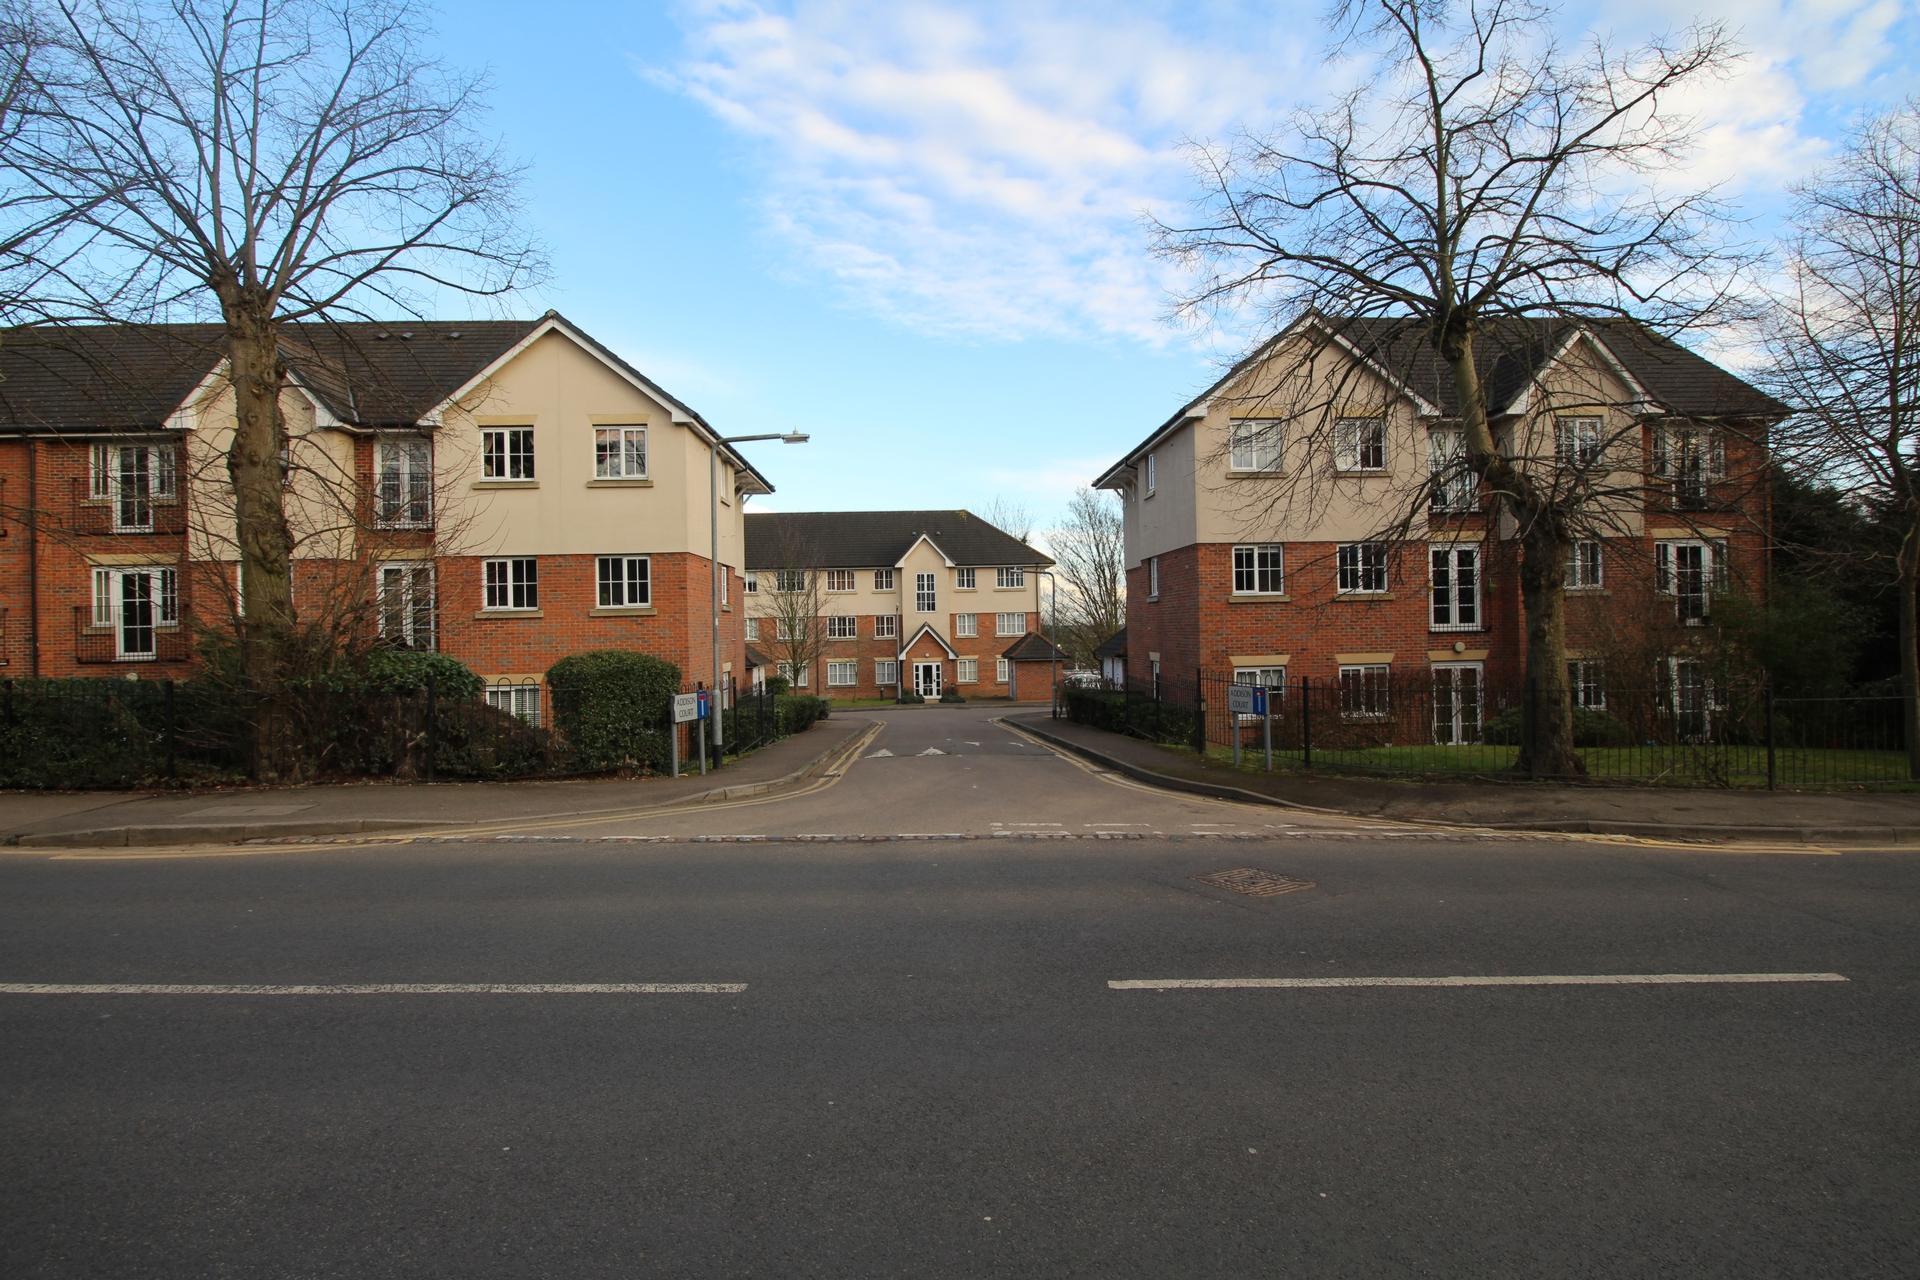 Addison Court  Epping  CM16